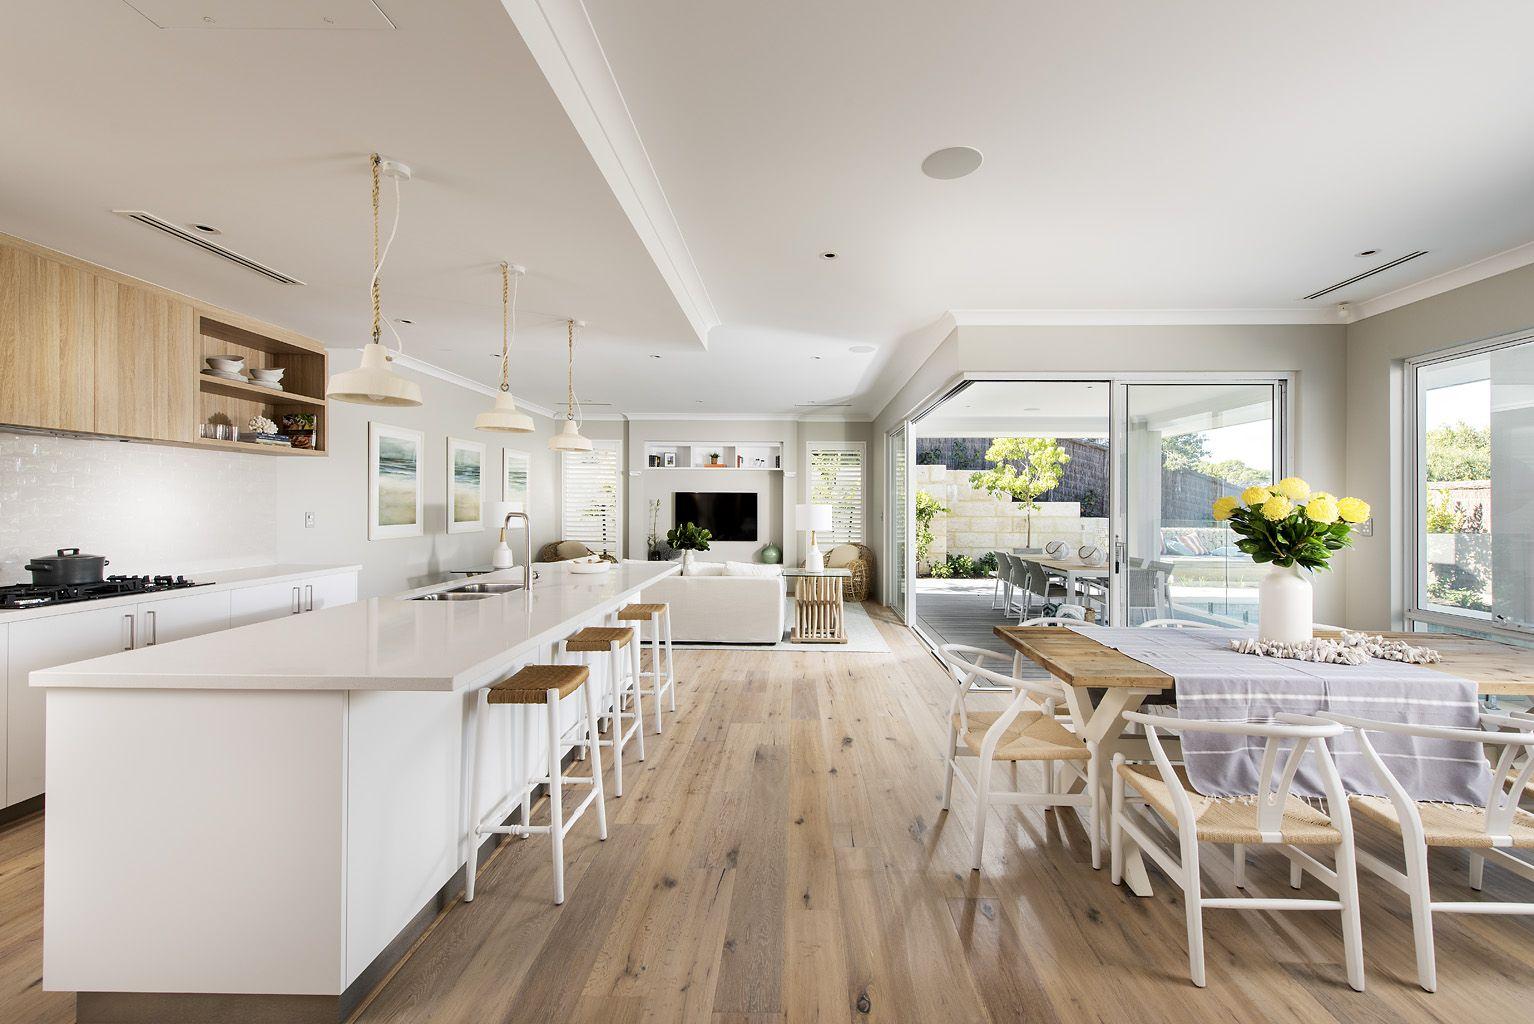 Polytec Kitchen Doors And Panels Natural Oak Ravine Dom I  # Muebles Rex Hurlingham